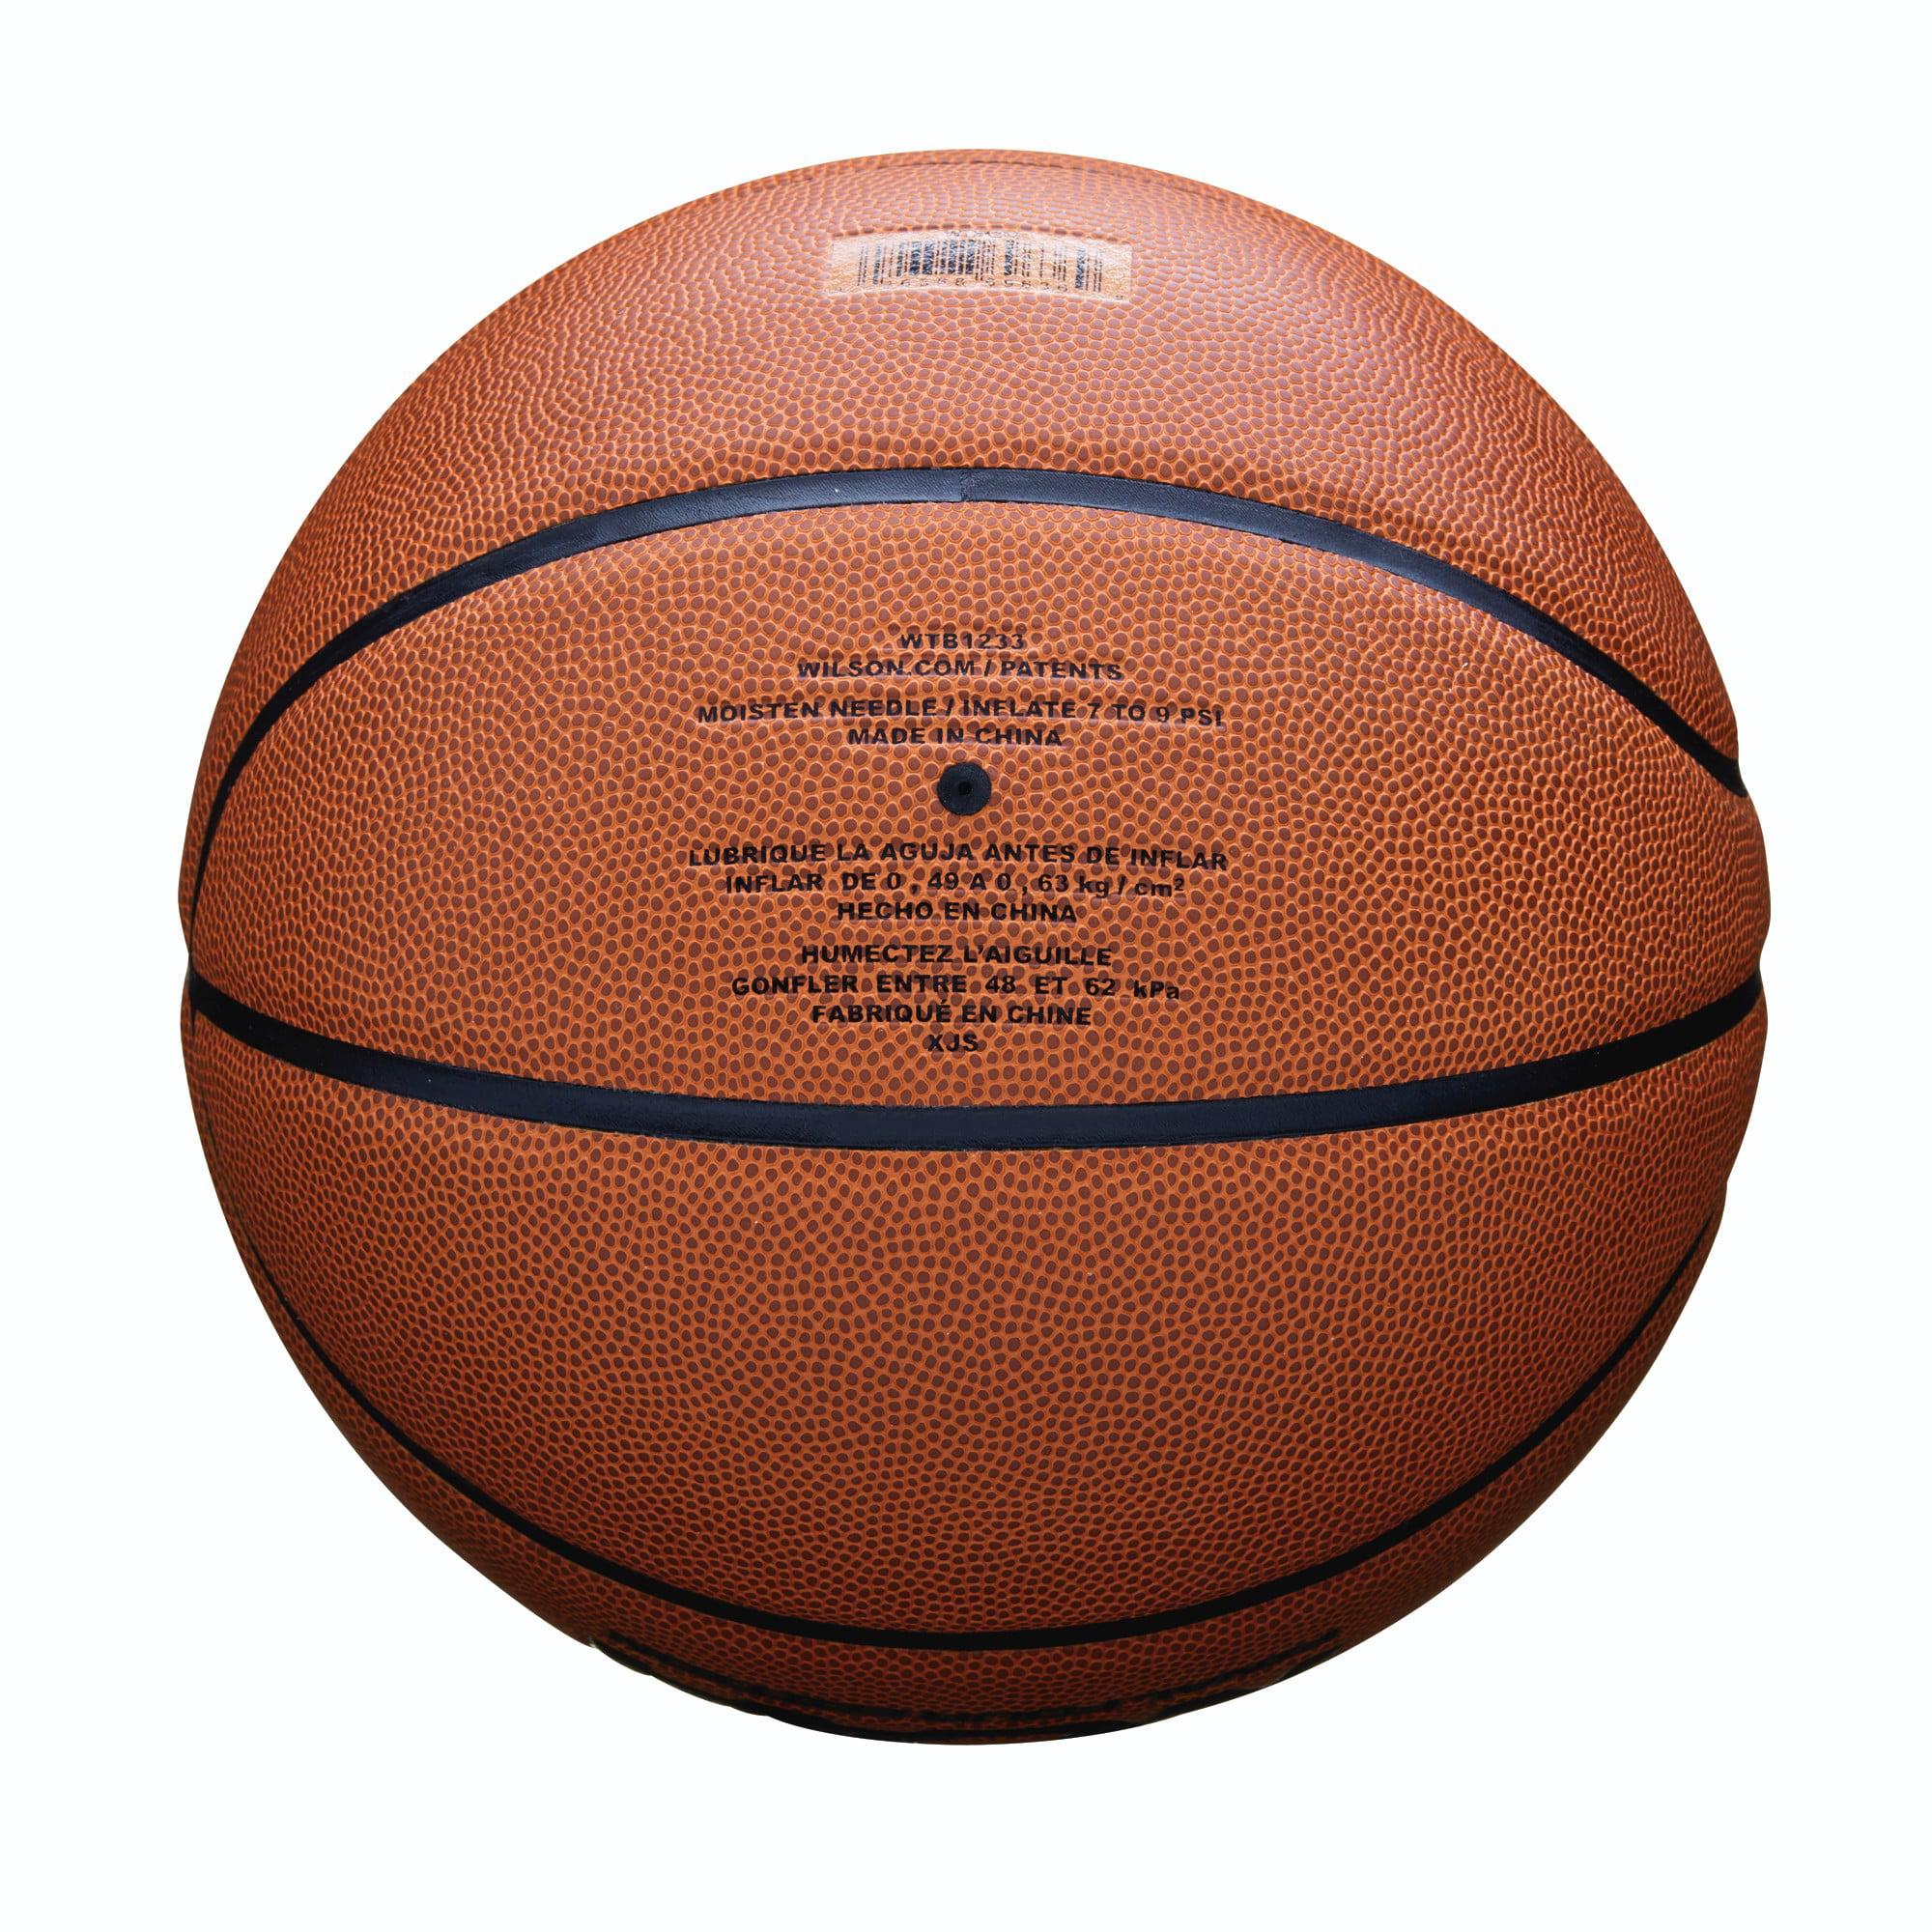 Wilson Ncaa Final Four Edition Basketball Official Size